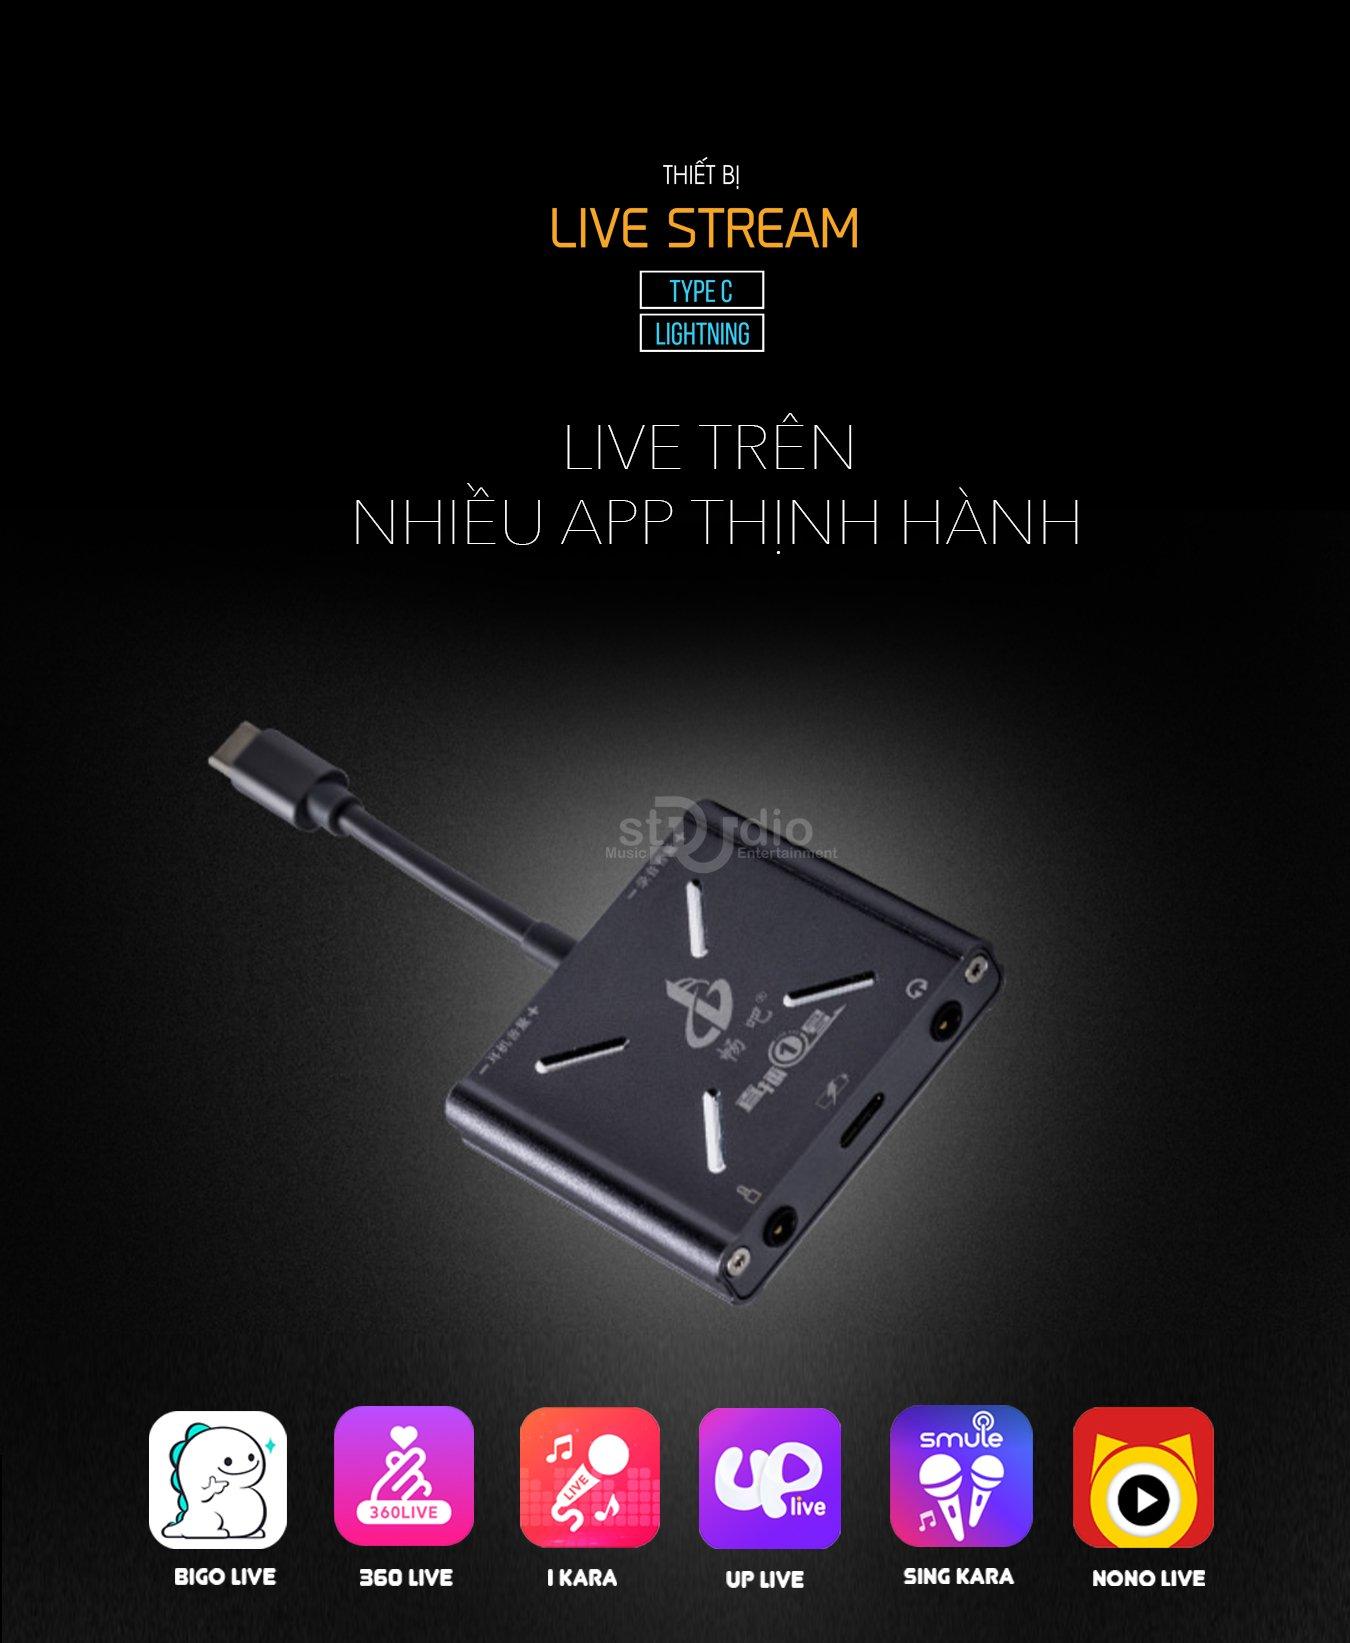 Dây livestream Type-C, dây livestream Lightning, dây livestream cho Androi, dây livestream cho Iphone đời mới nhất (Mono)